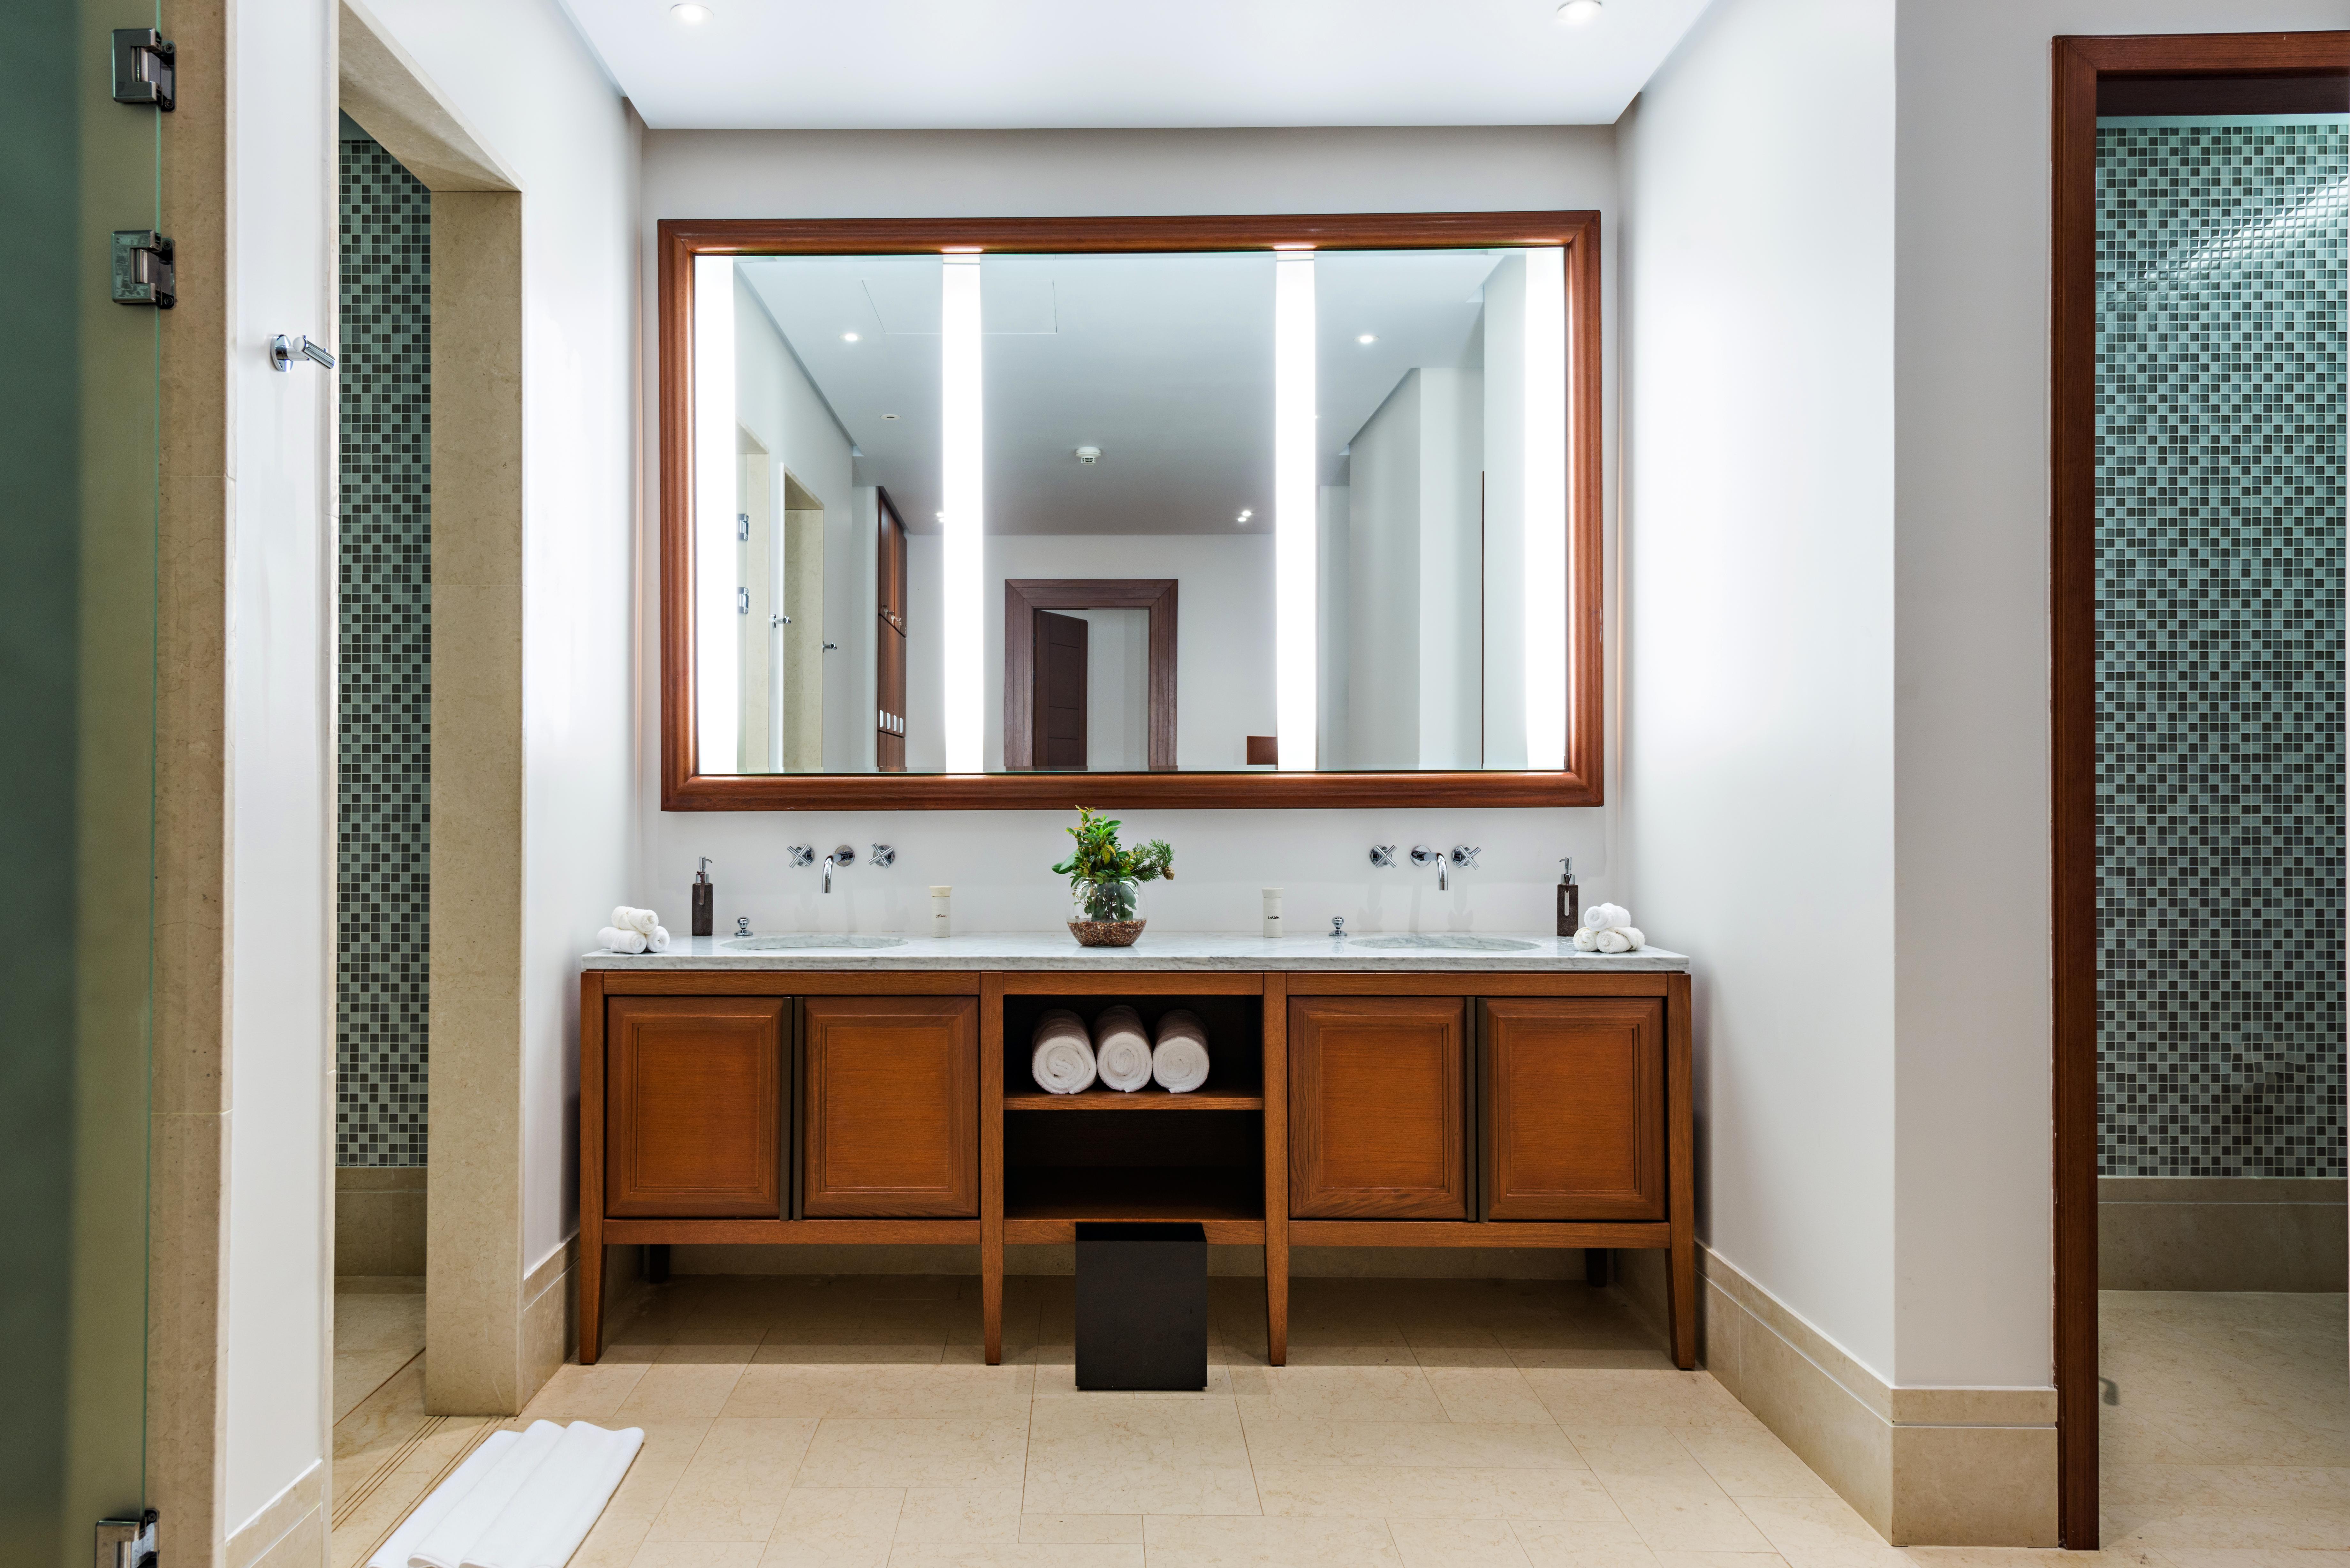 Savannah GA Bathroom Remodelers General Contractor American Craftsman Renovations 912-481-8353